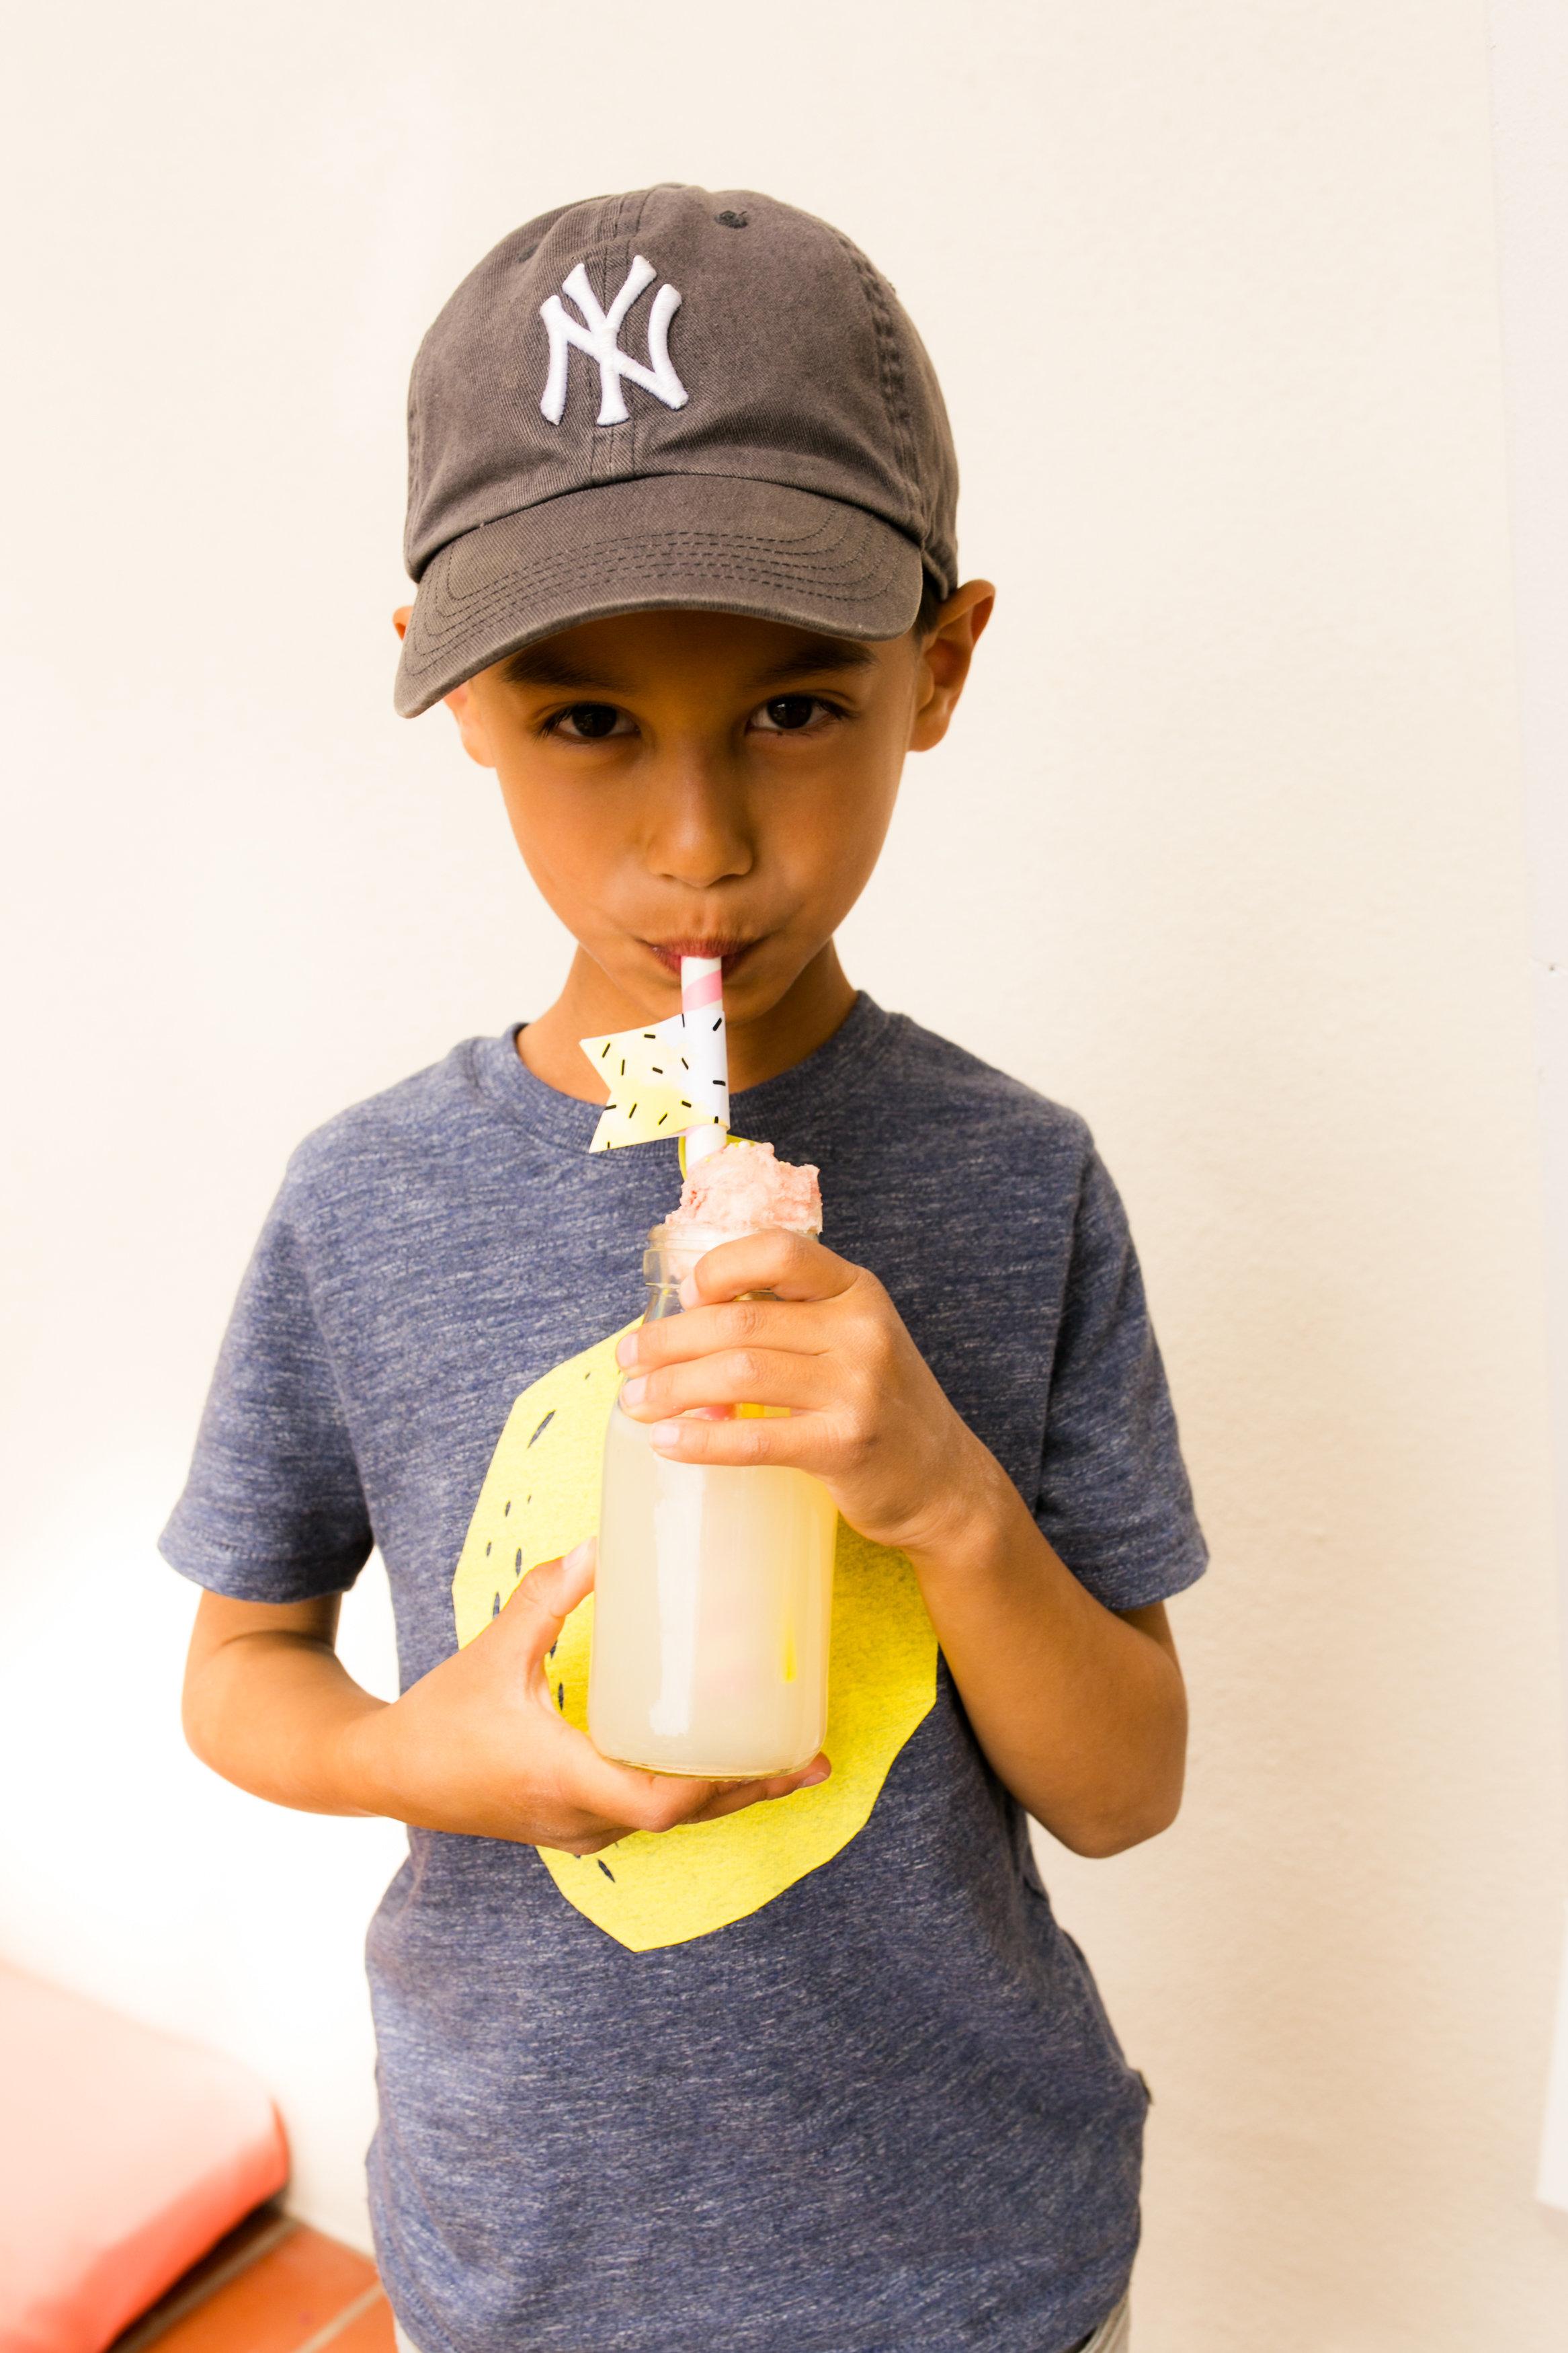 Lemonade Kids Birthday Party - Little boy and Lemonade